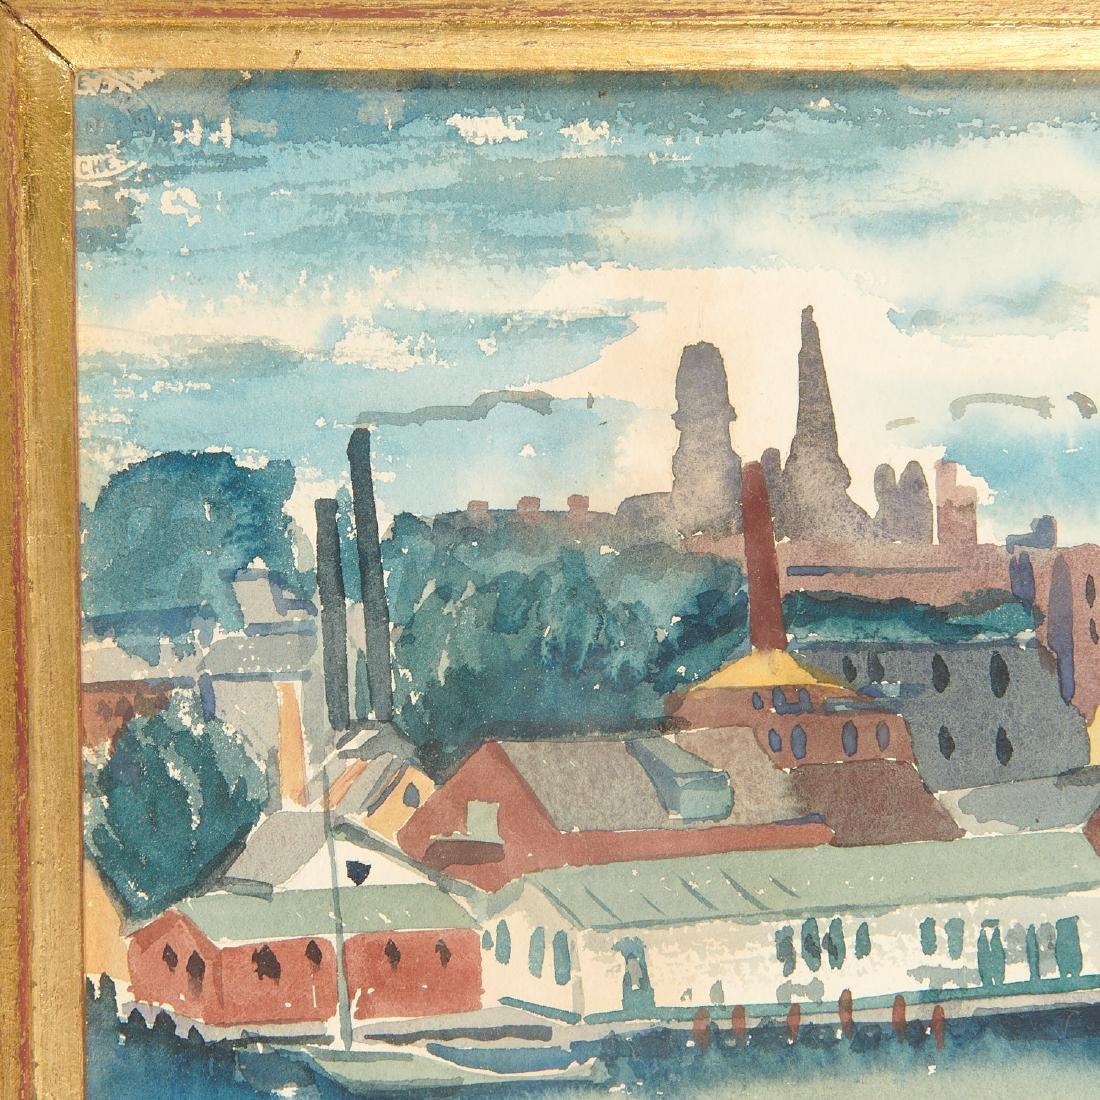 Austin Mecklem, painting, 1931 - 3